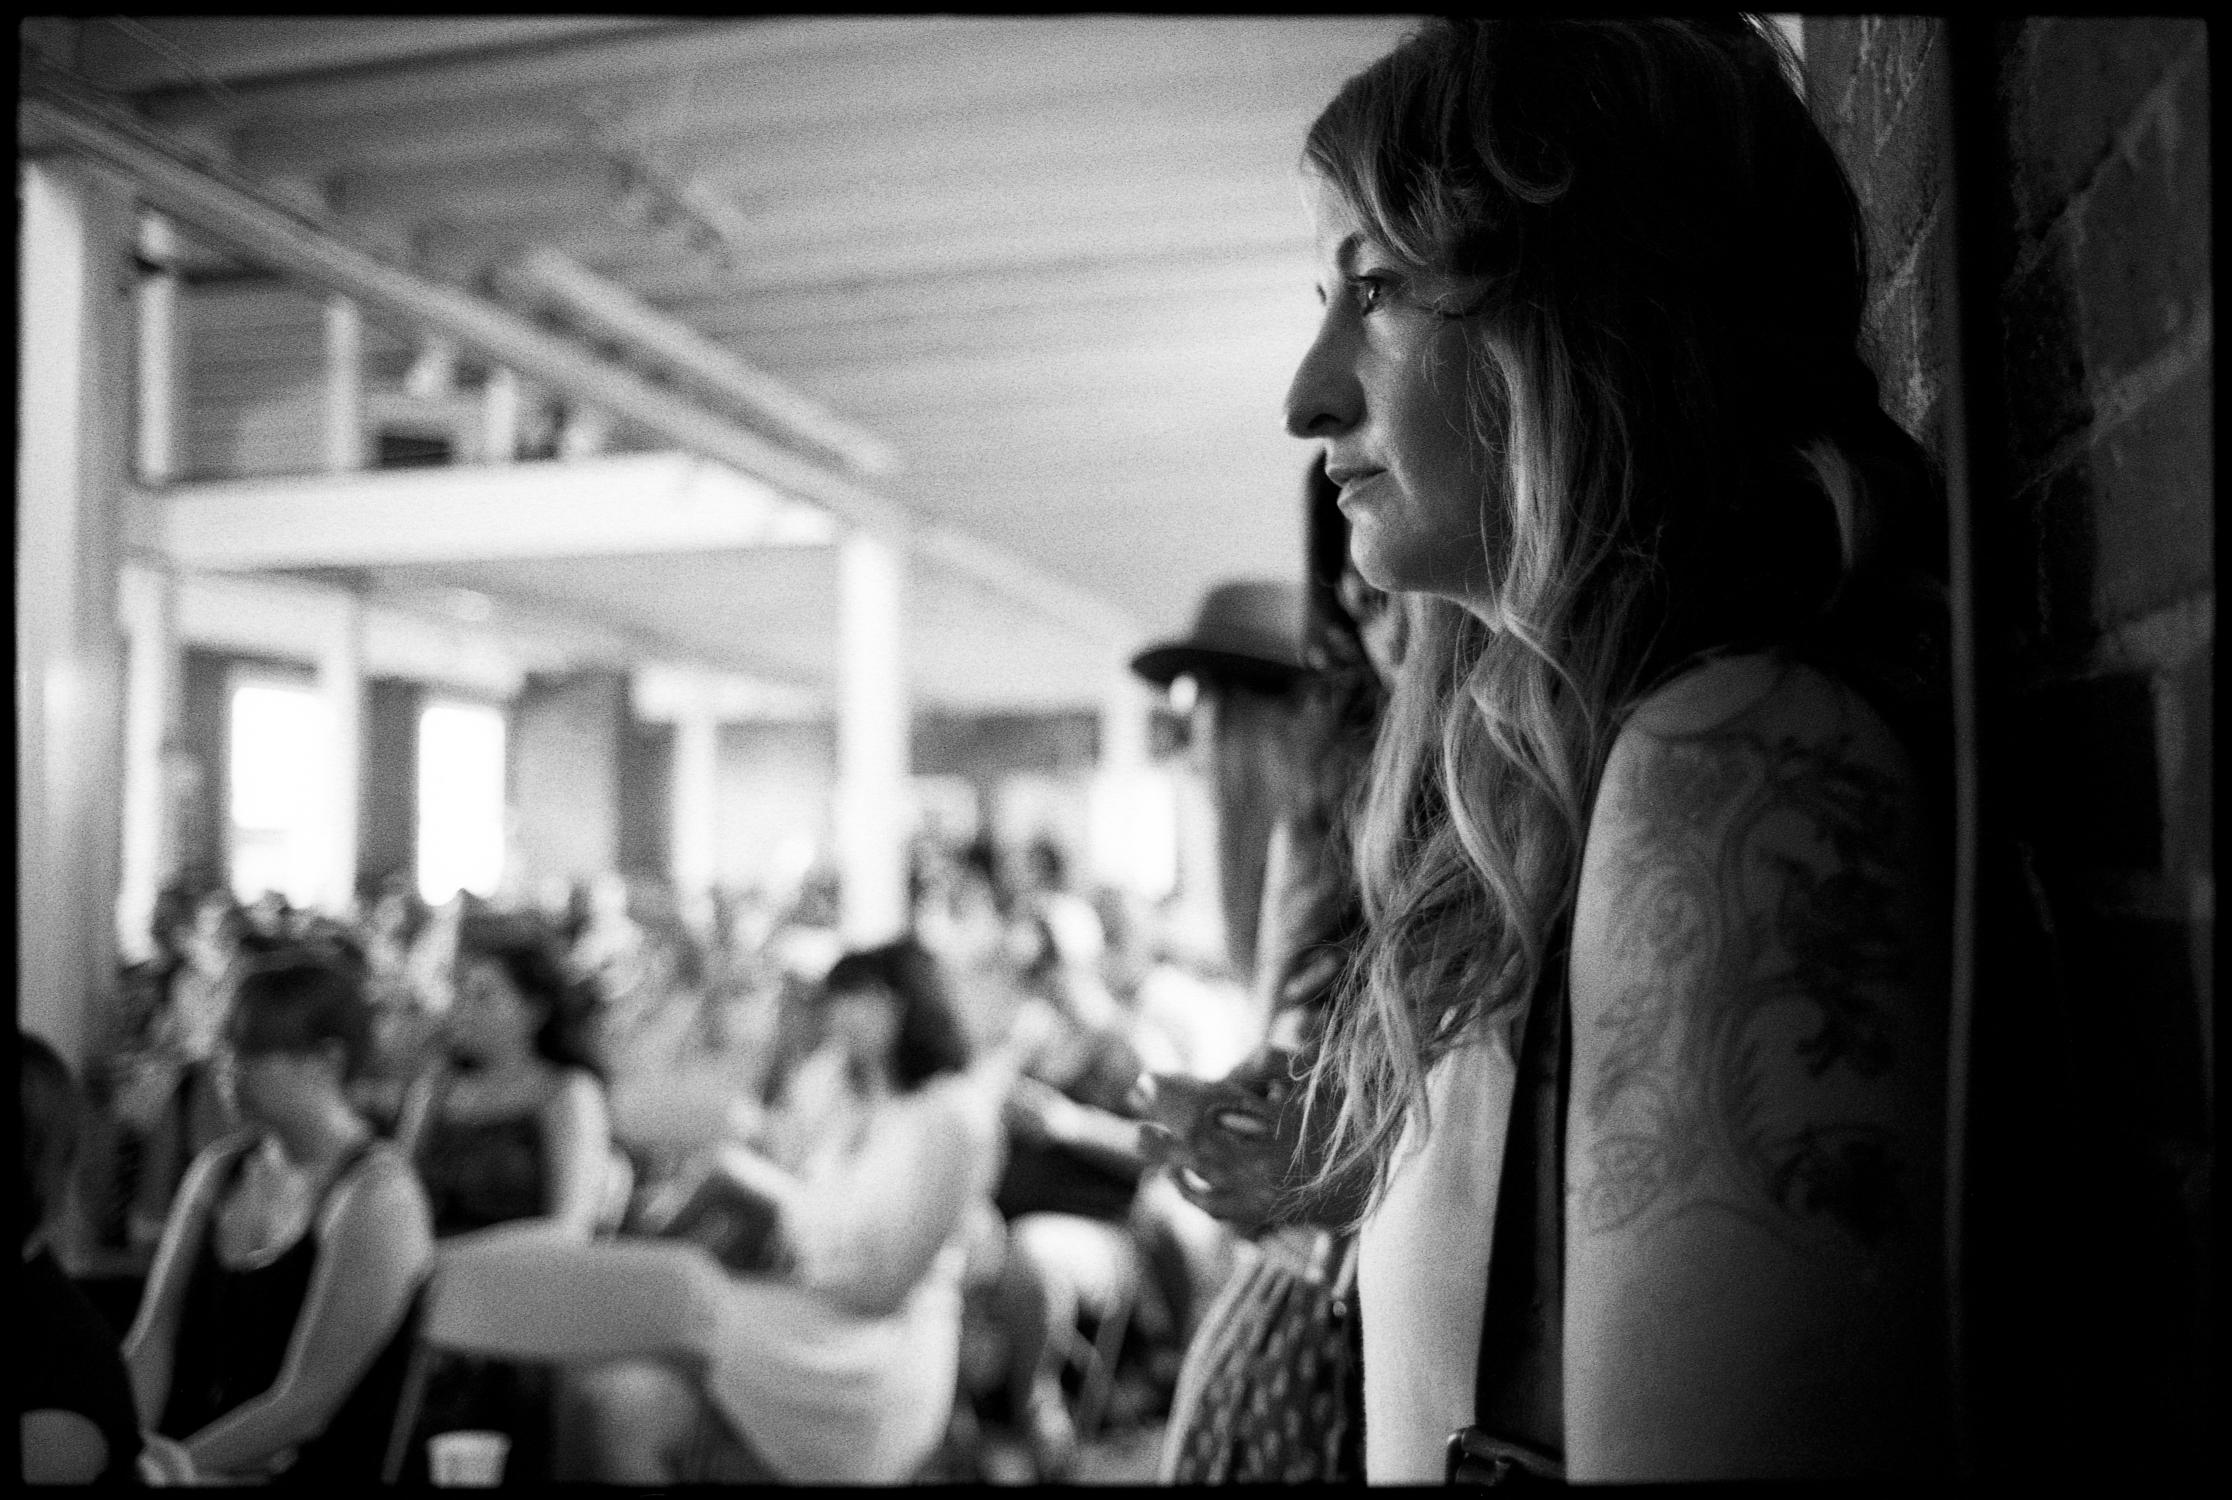 Margo Price watching performances at Newport Folk Fest